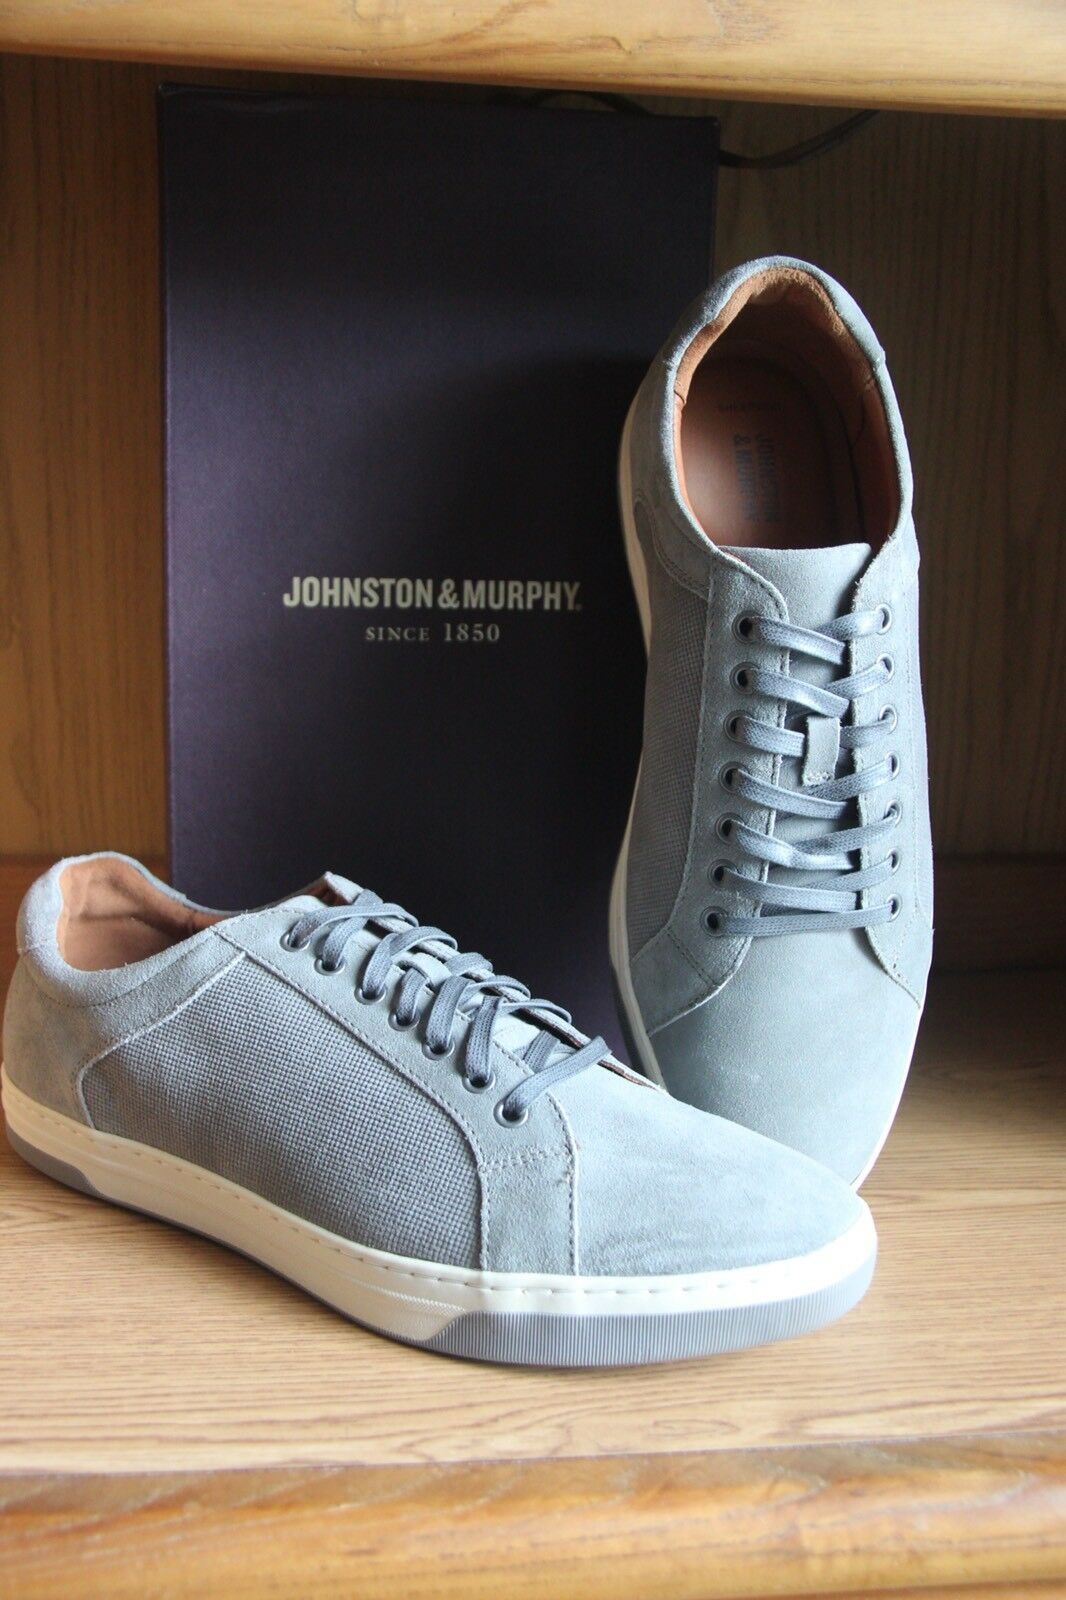 Johnston & Murphy Fenton Lace to Toe Shoe Grey Men Size 12  252639